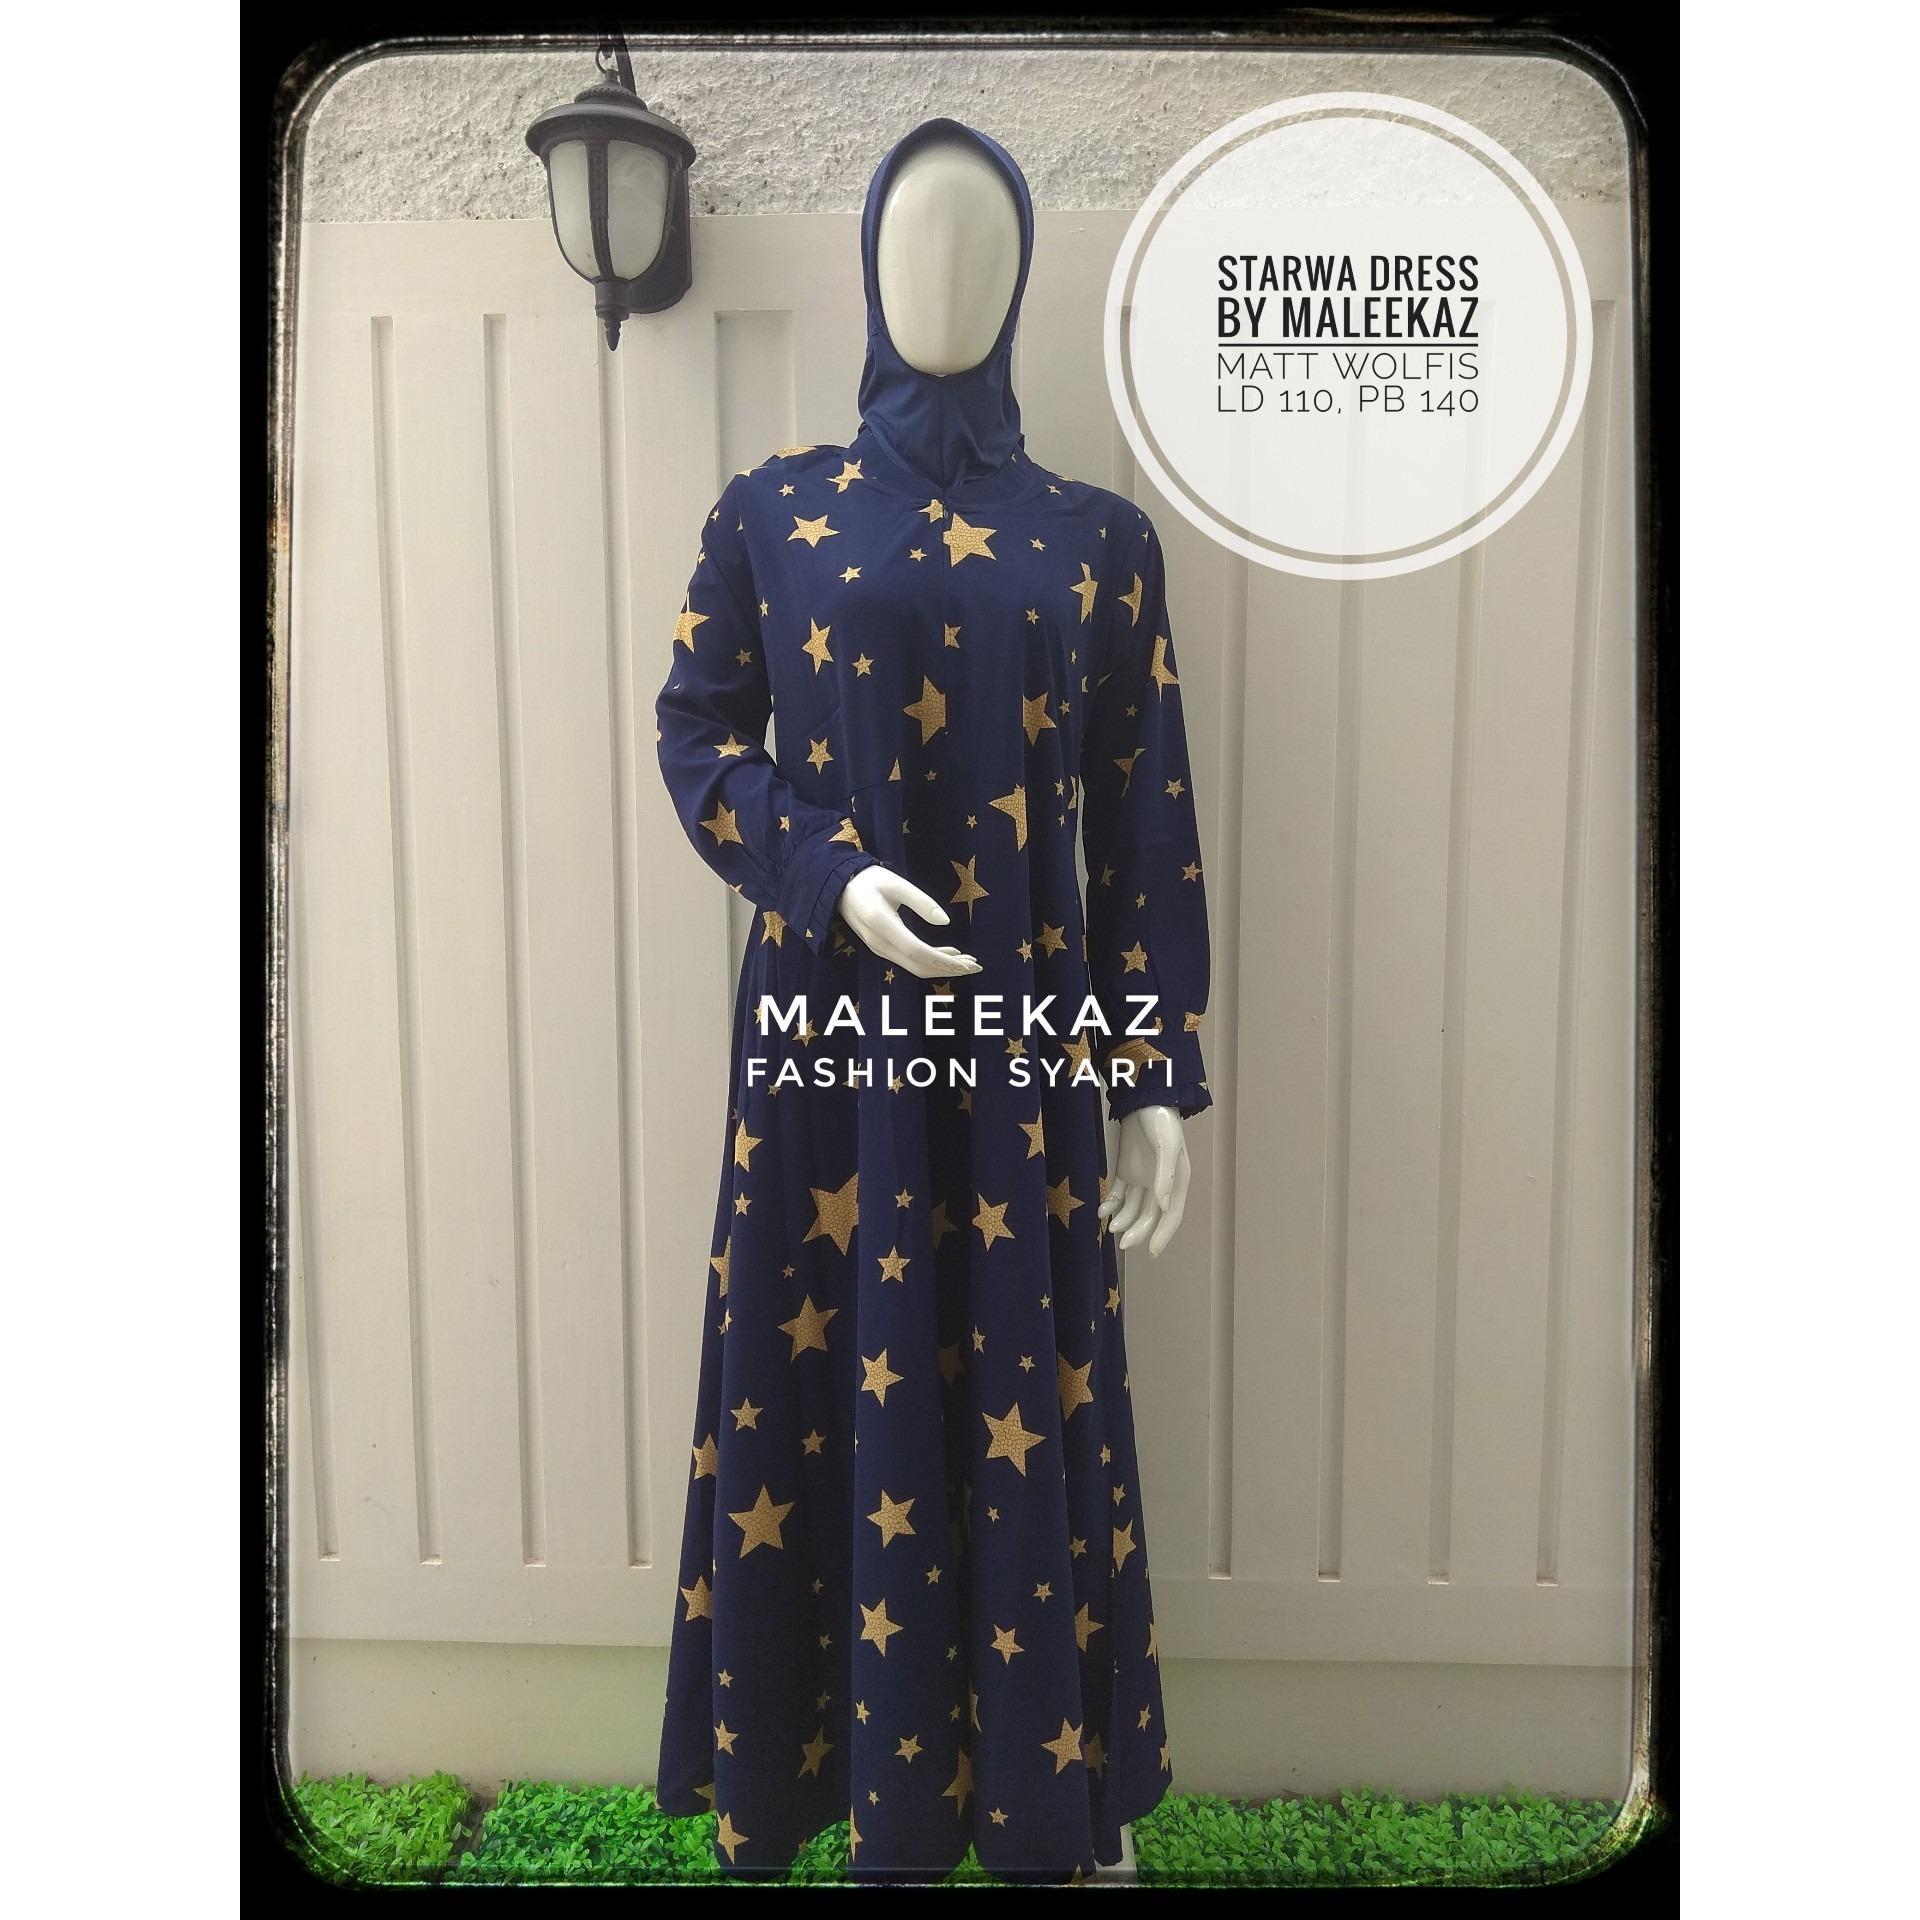 Spesifikasi Gamis Syari Maleeka Starwa Dress Navy Murah Berkualitas